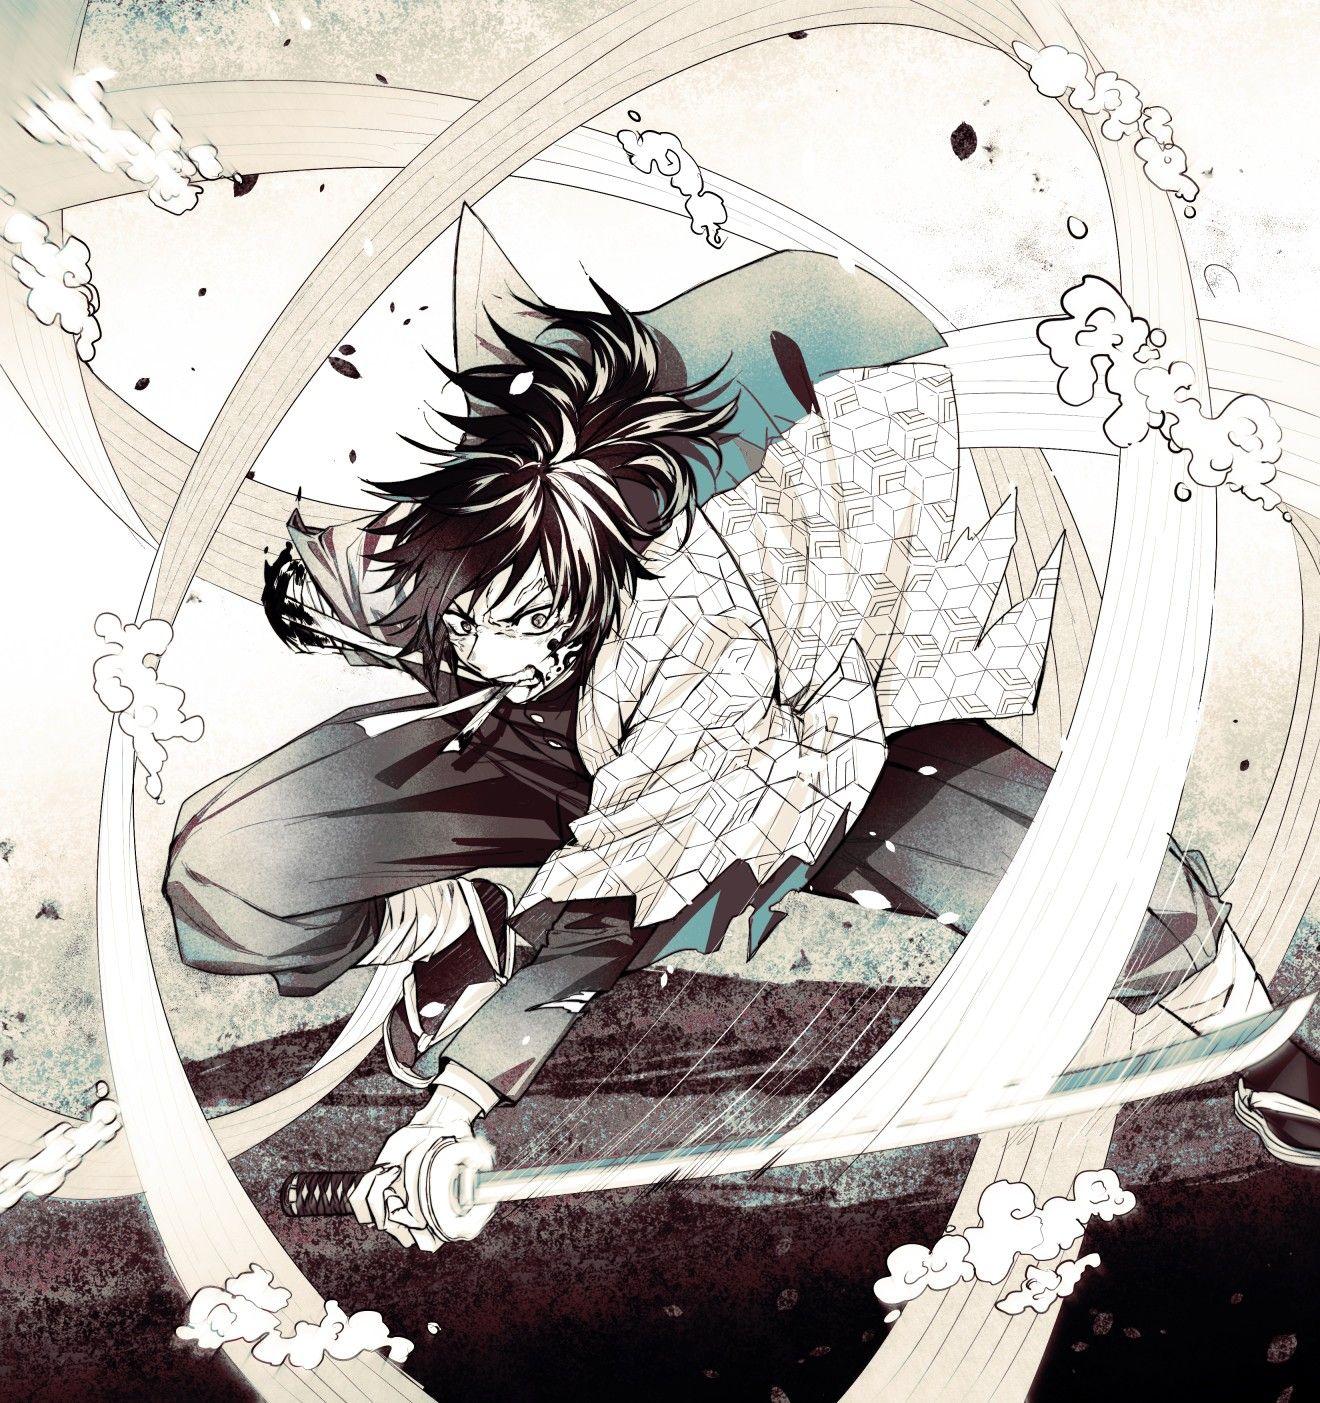 Pin on Kimetsu no Yaiba / Demon Slayer / 鬼滅の刃